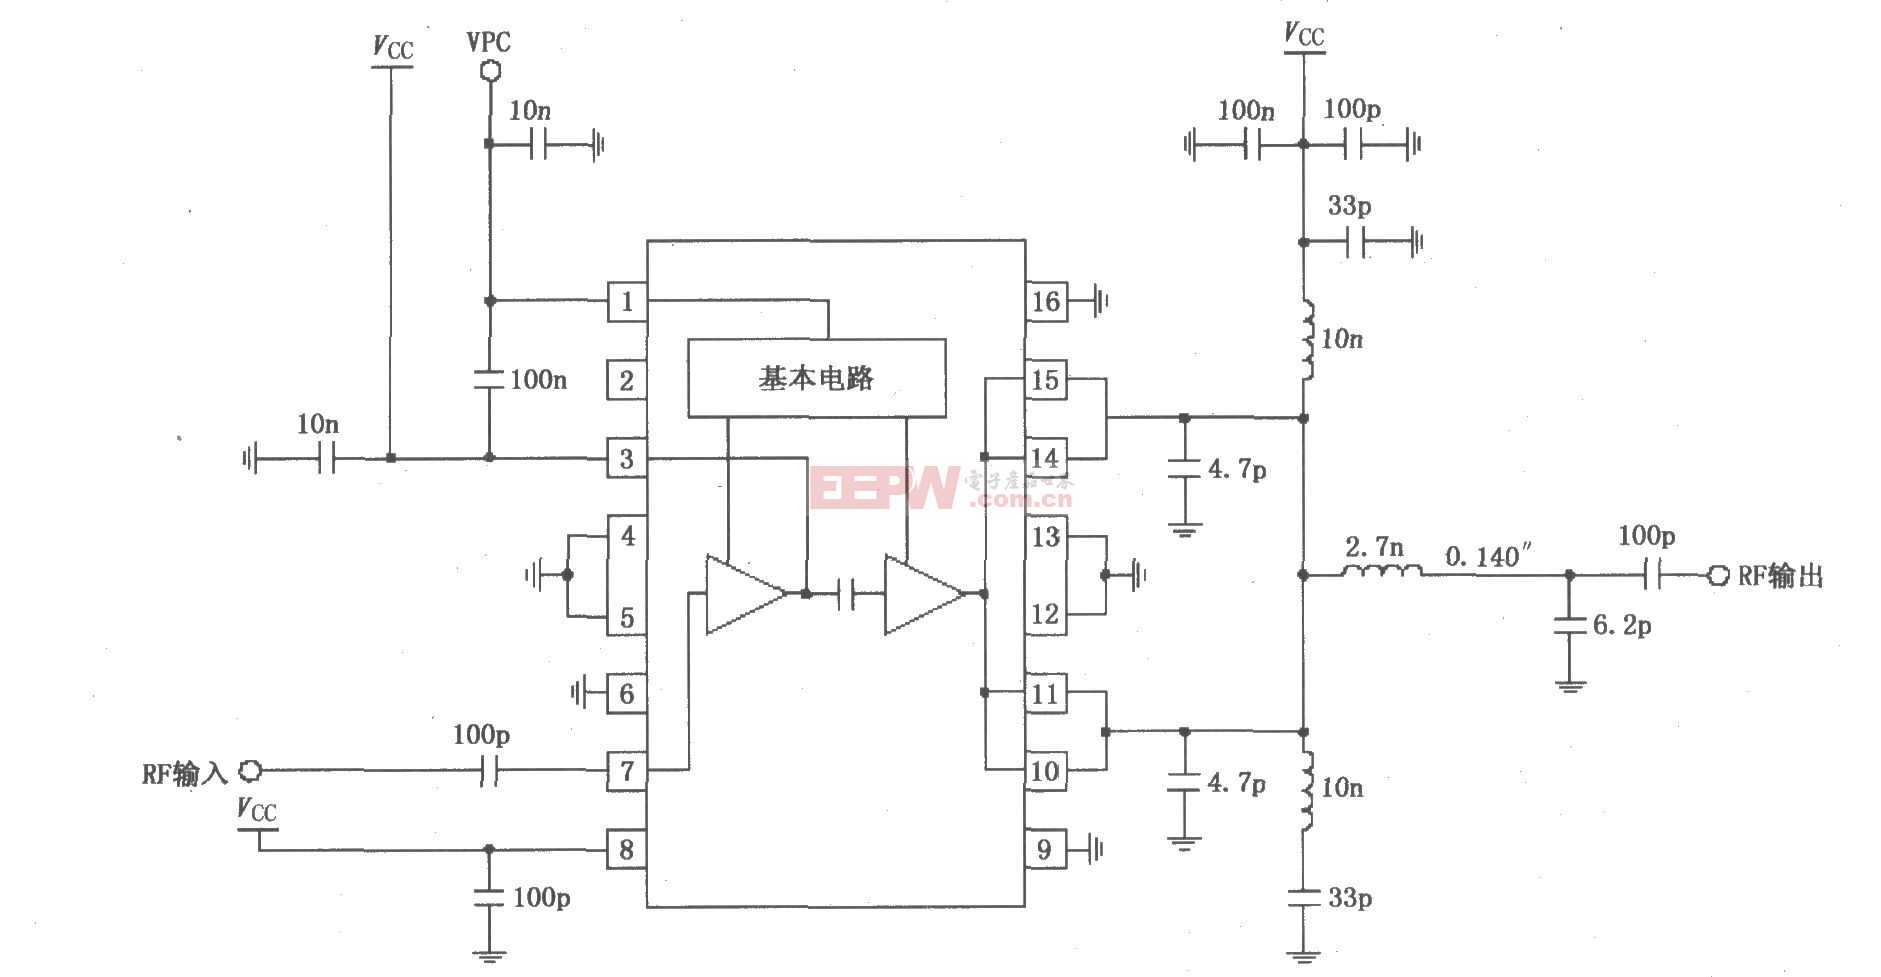 RF2131在4.0~4.8V電源供電時獲得最佳功率和效率放大器電路圖